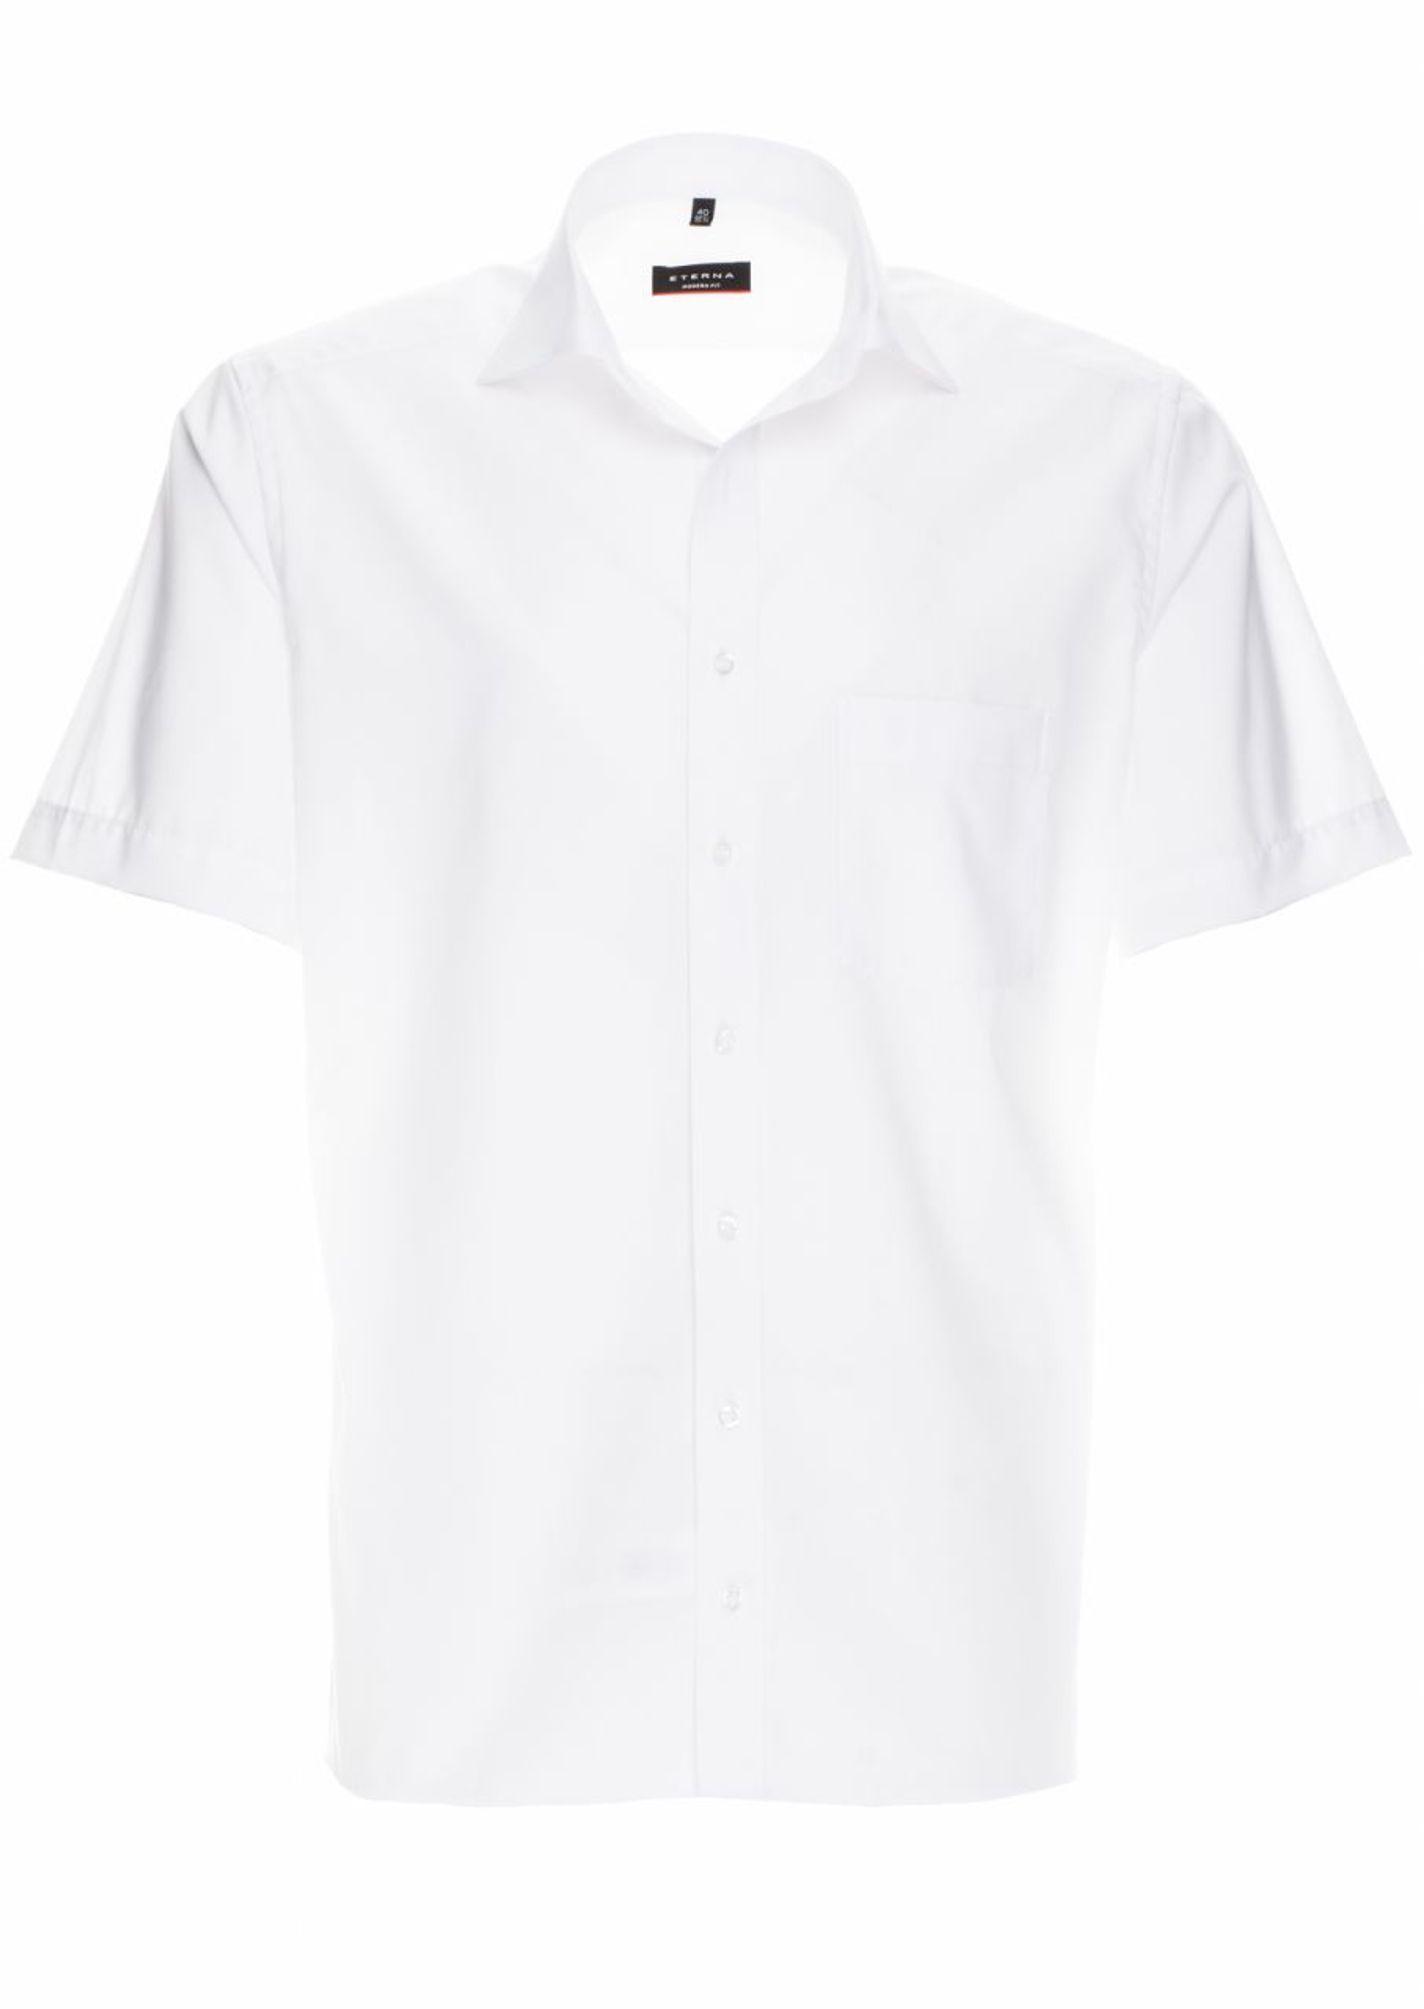 size 40 ea9f3 2e355 Eterna - Modern Fit - Bügelfreies Herren Kurzarm Hemd mit Kent-Kragen in  verschiedenen Farben, Uni Popeline (1100 C187)